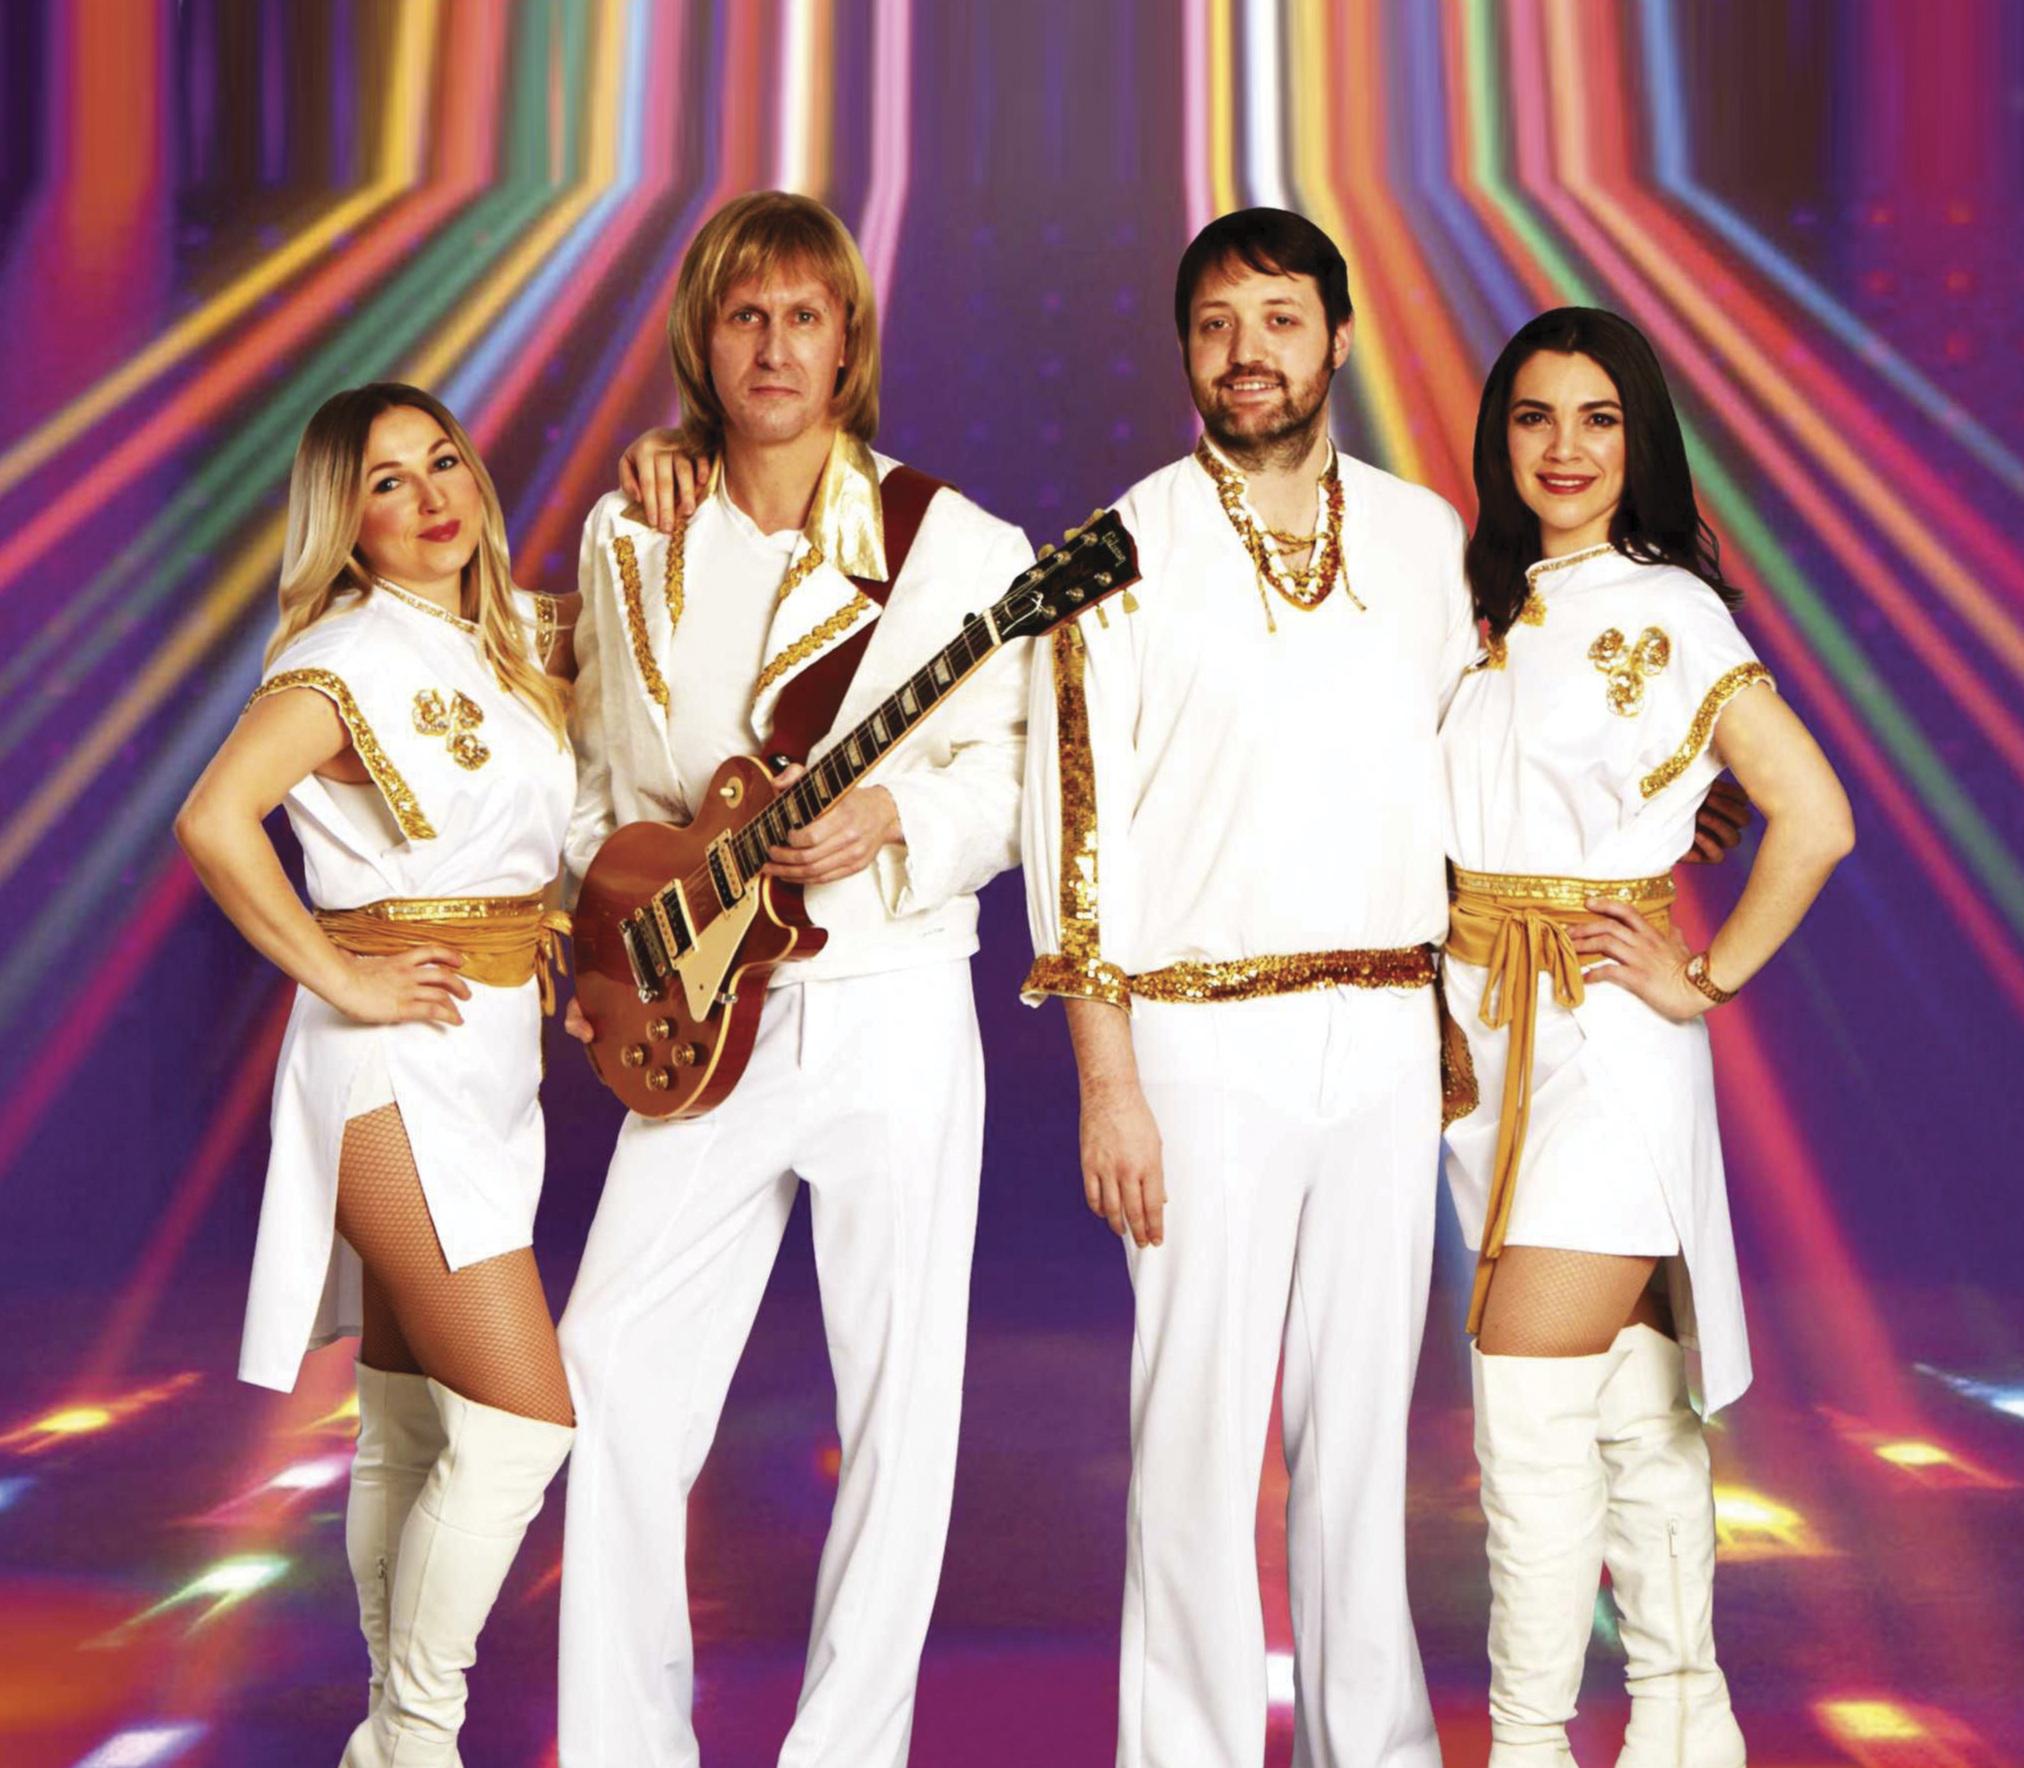 Dancing Dream Abba Tribute Band